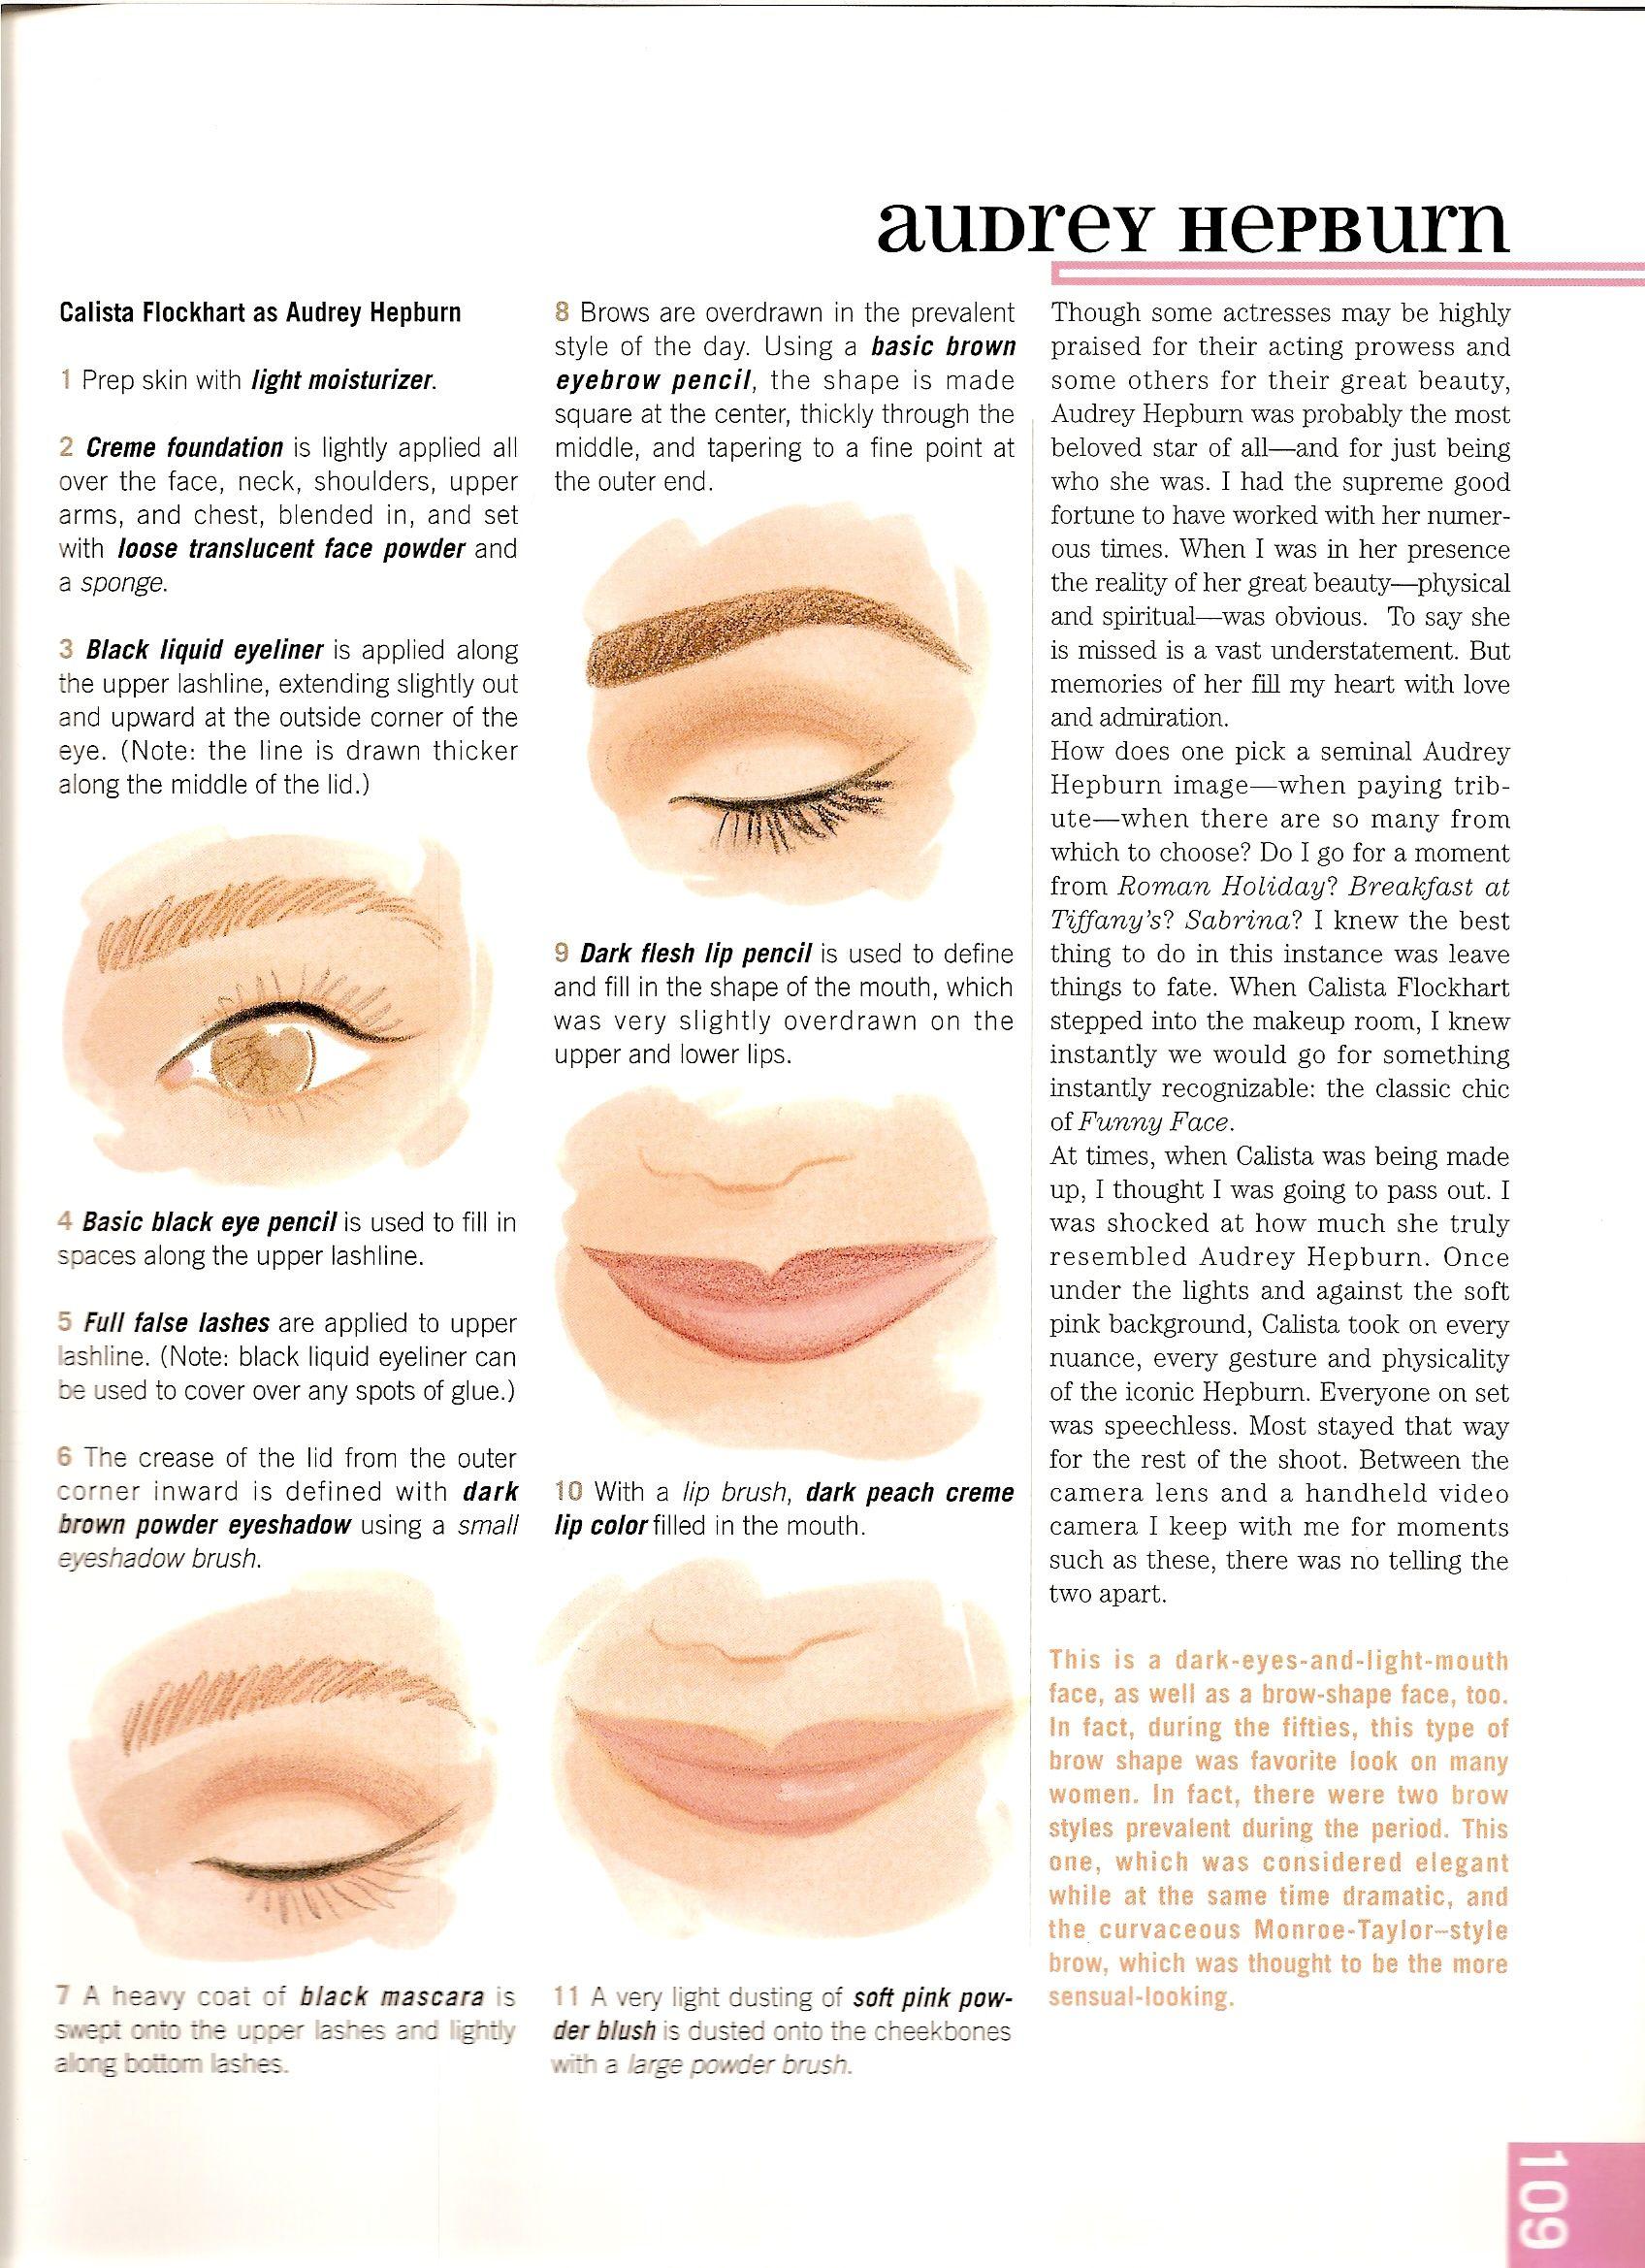 Audrey hepburn makeup how to fun to try your face is a canvas audrey hepburn makeup how to makeup tutorials baditri Gallery